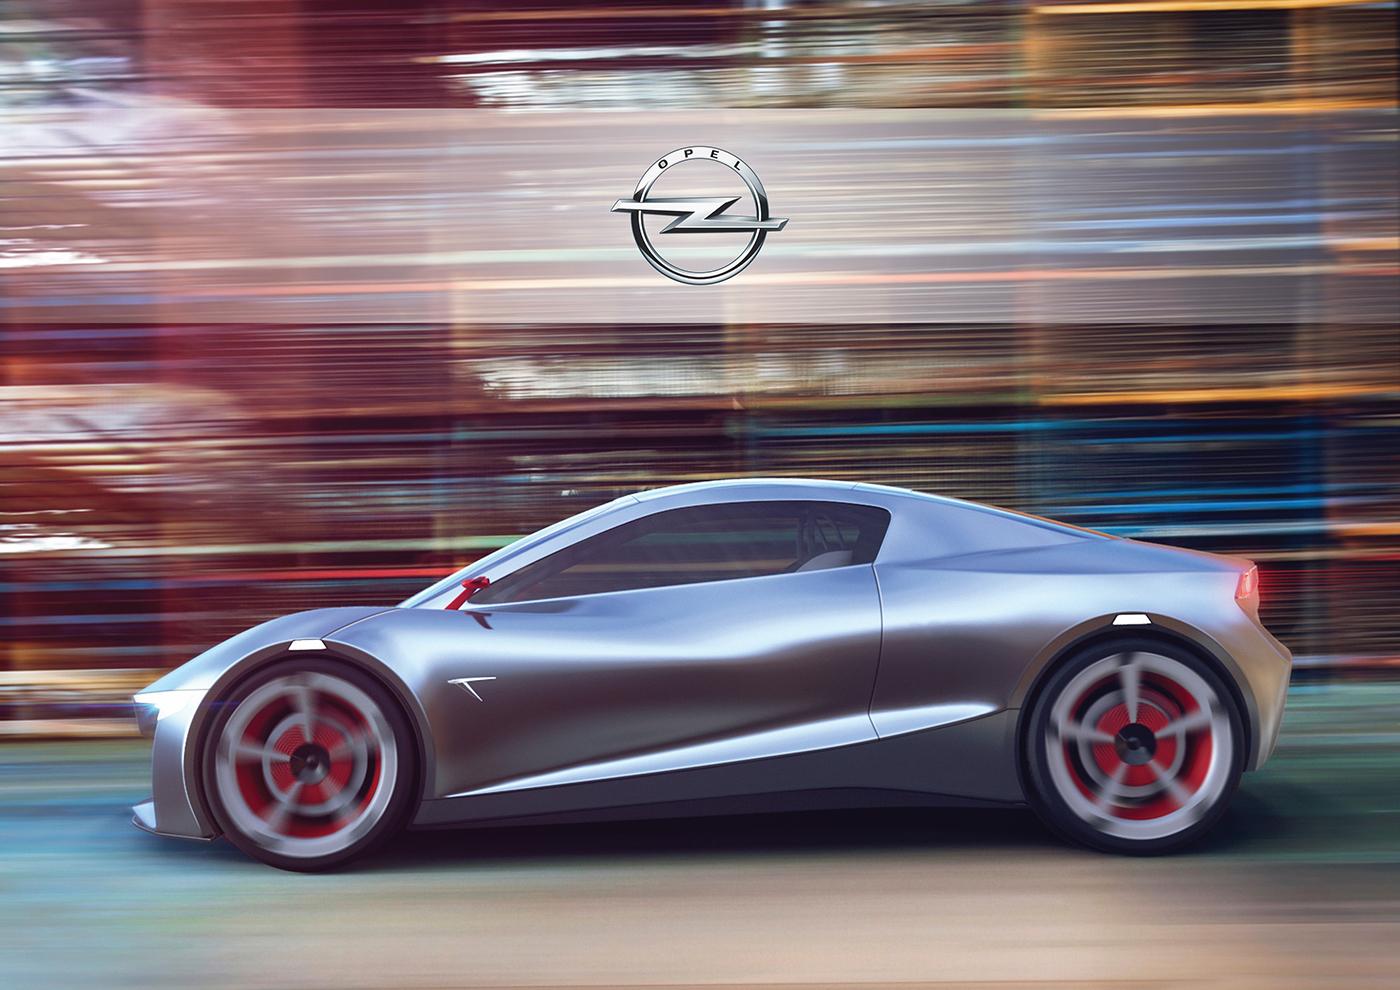 Opel Tigra 2020 Redesign By Kamil Podolak Motivezine